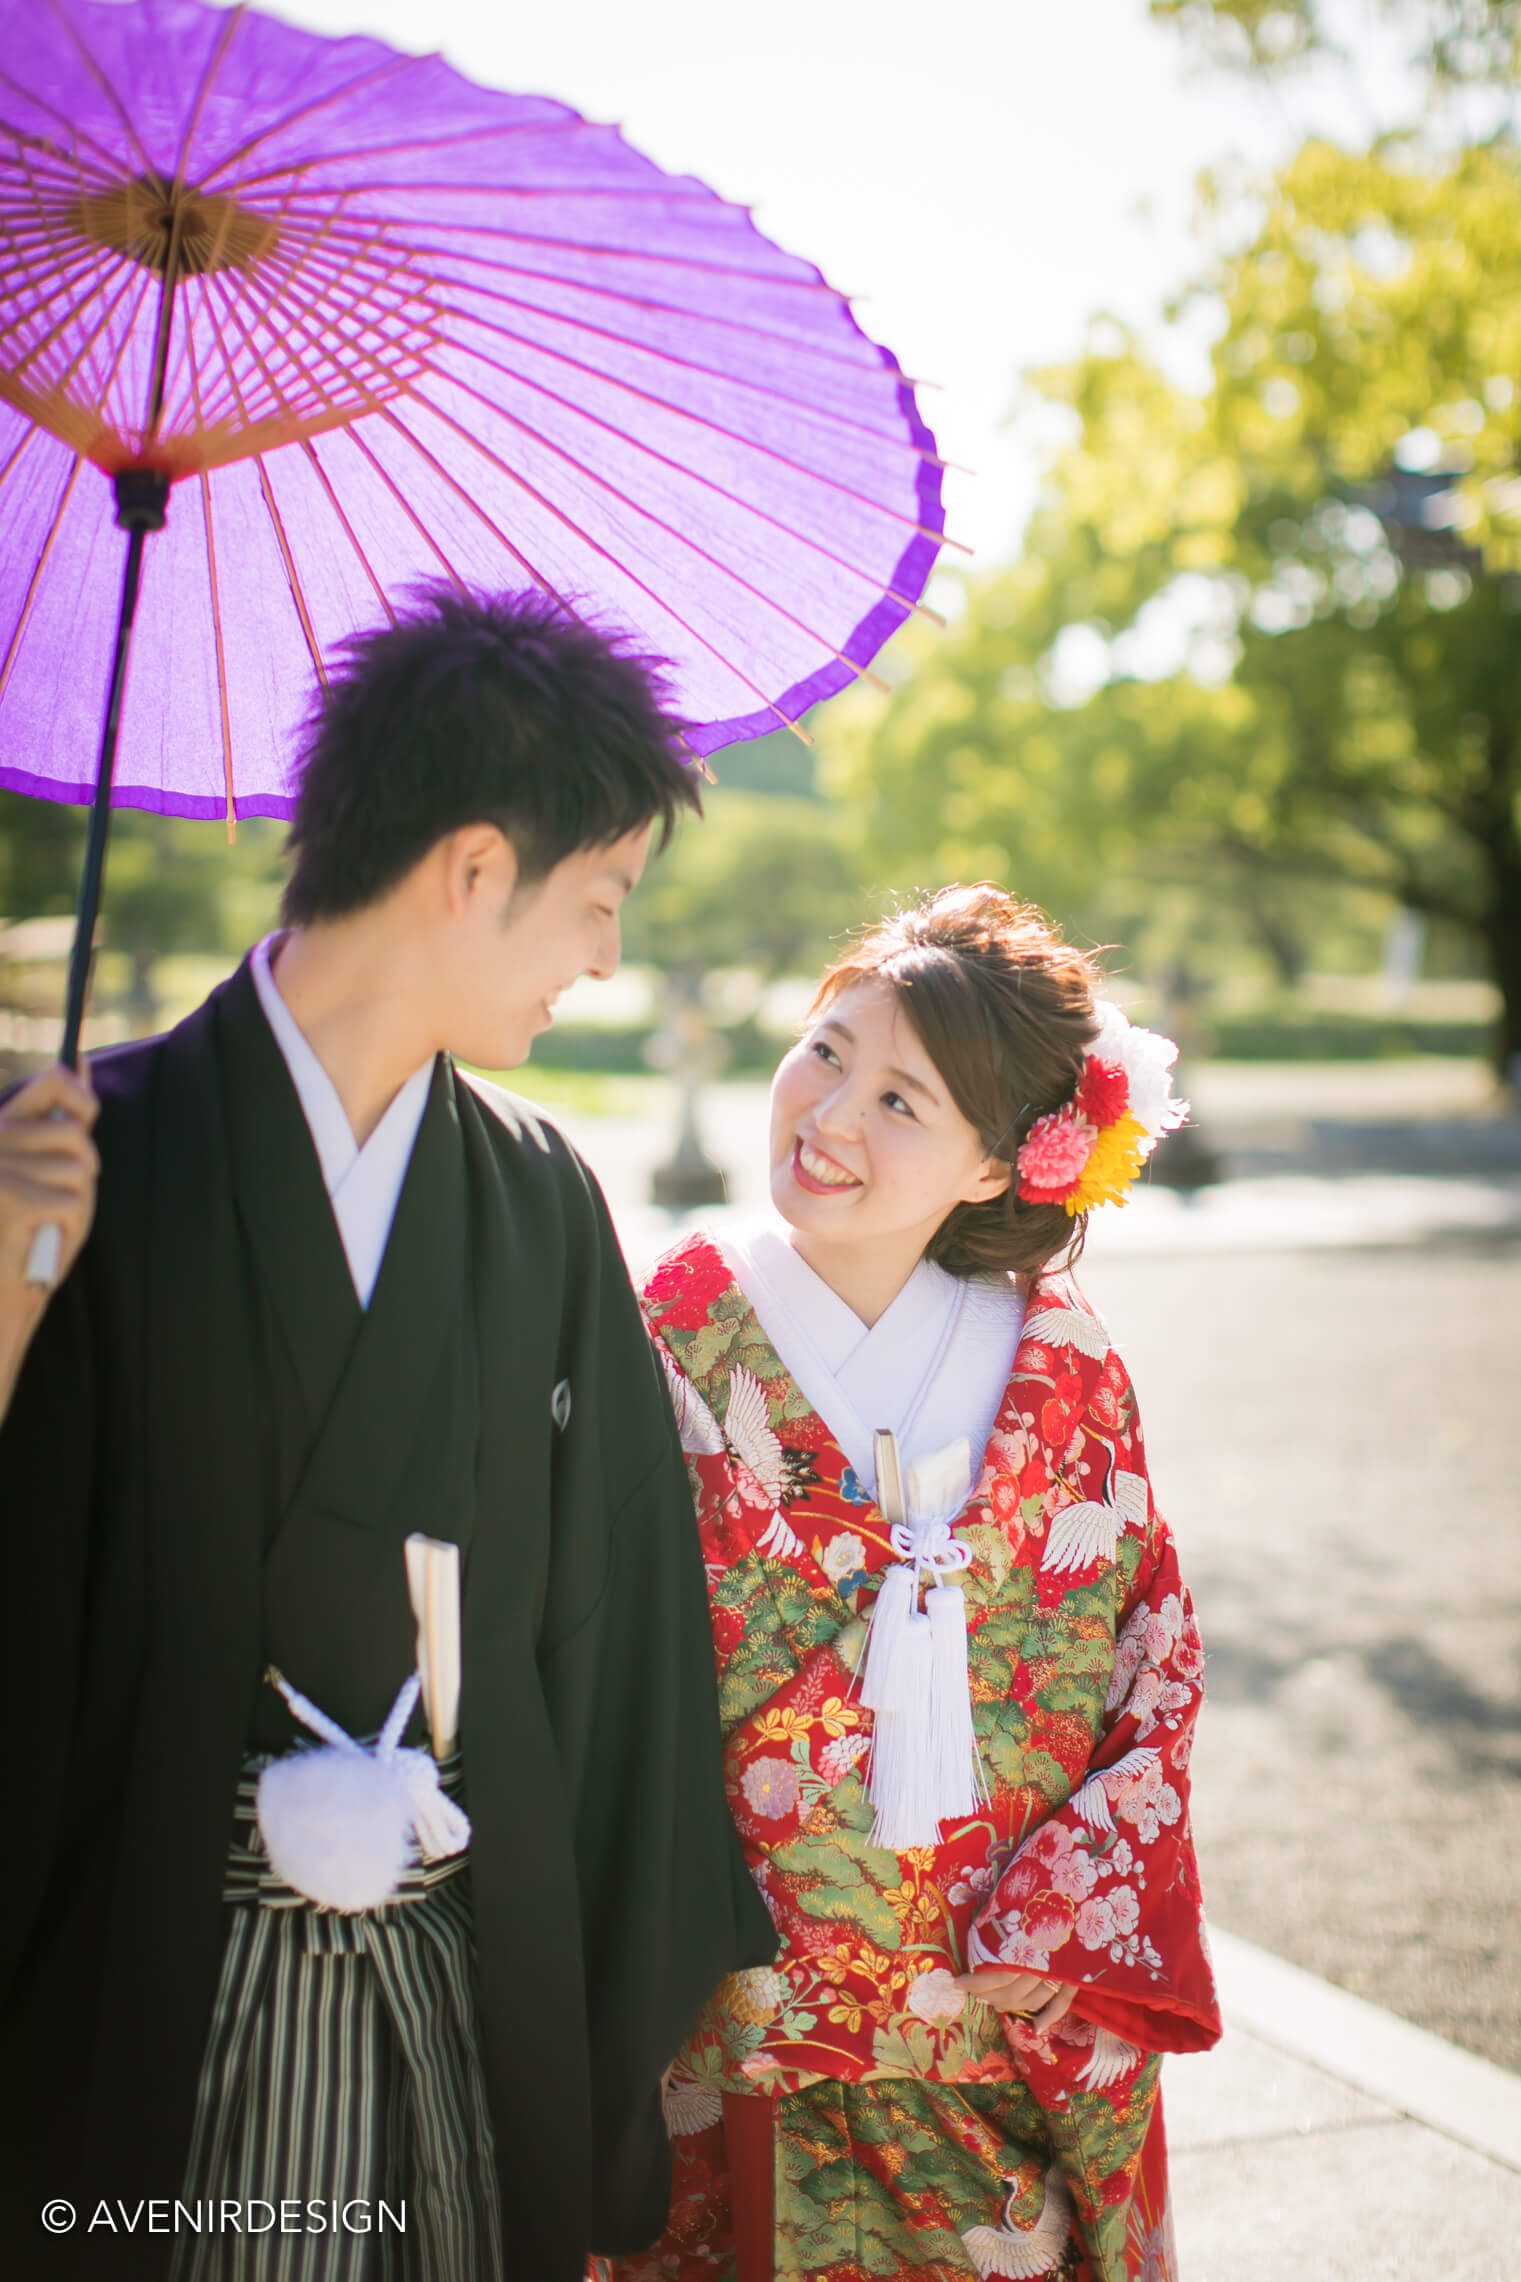 和装|前撮り撮影|熊本